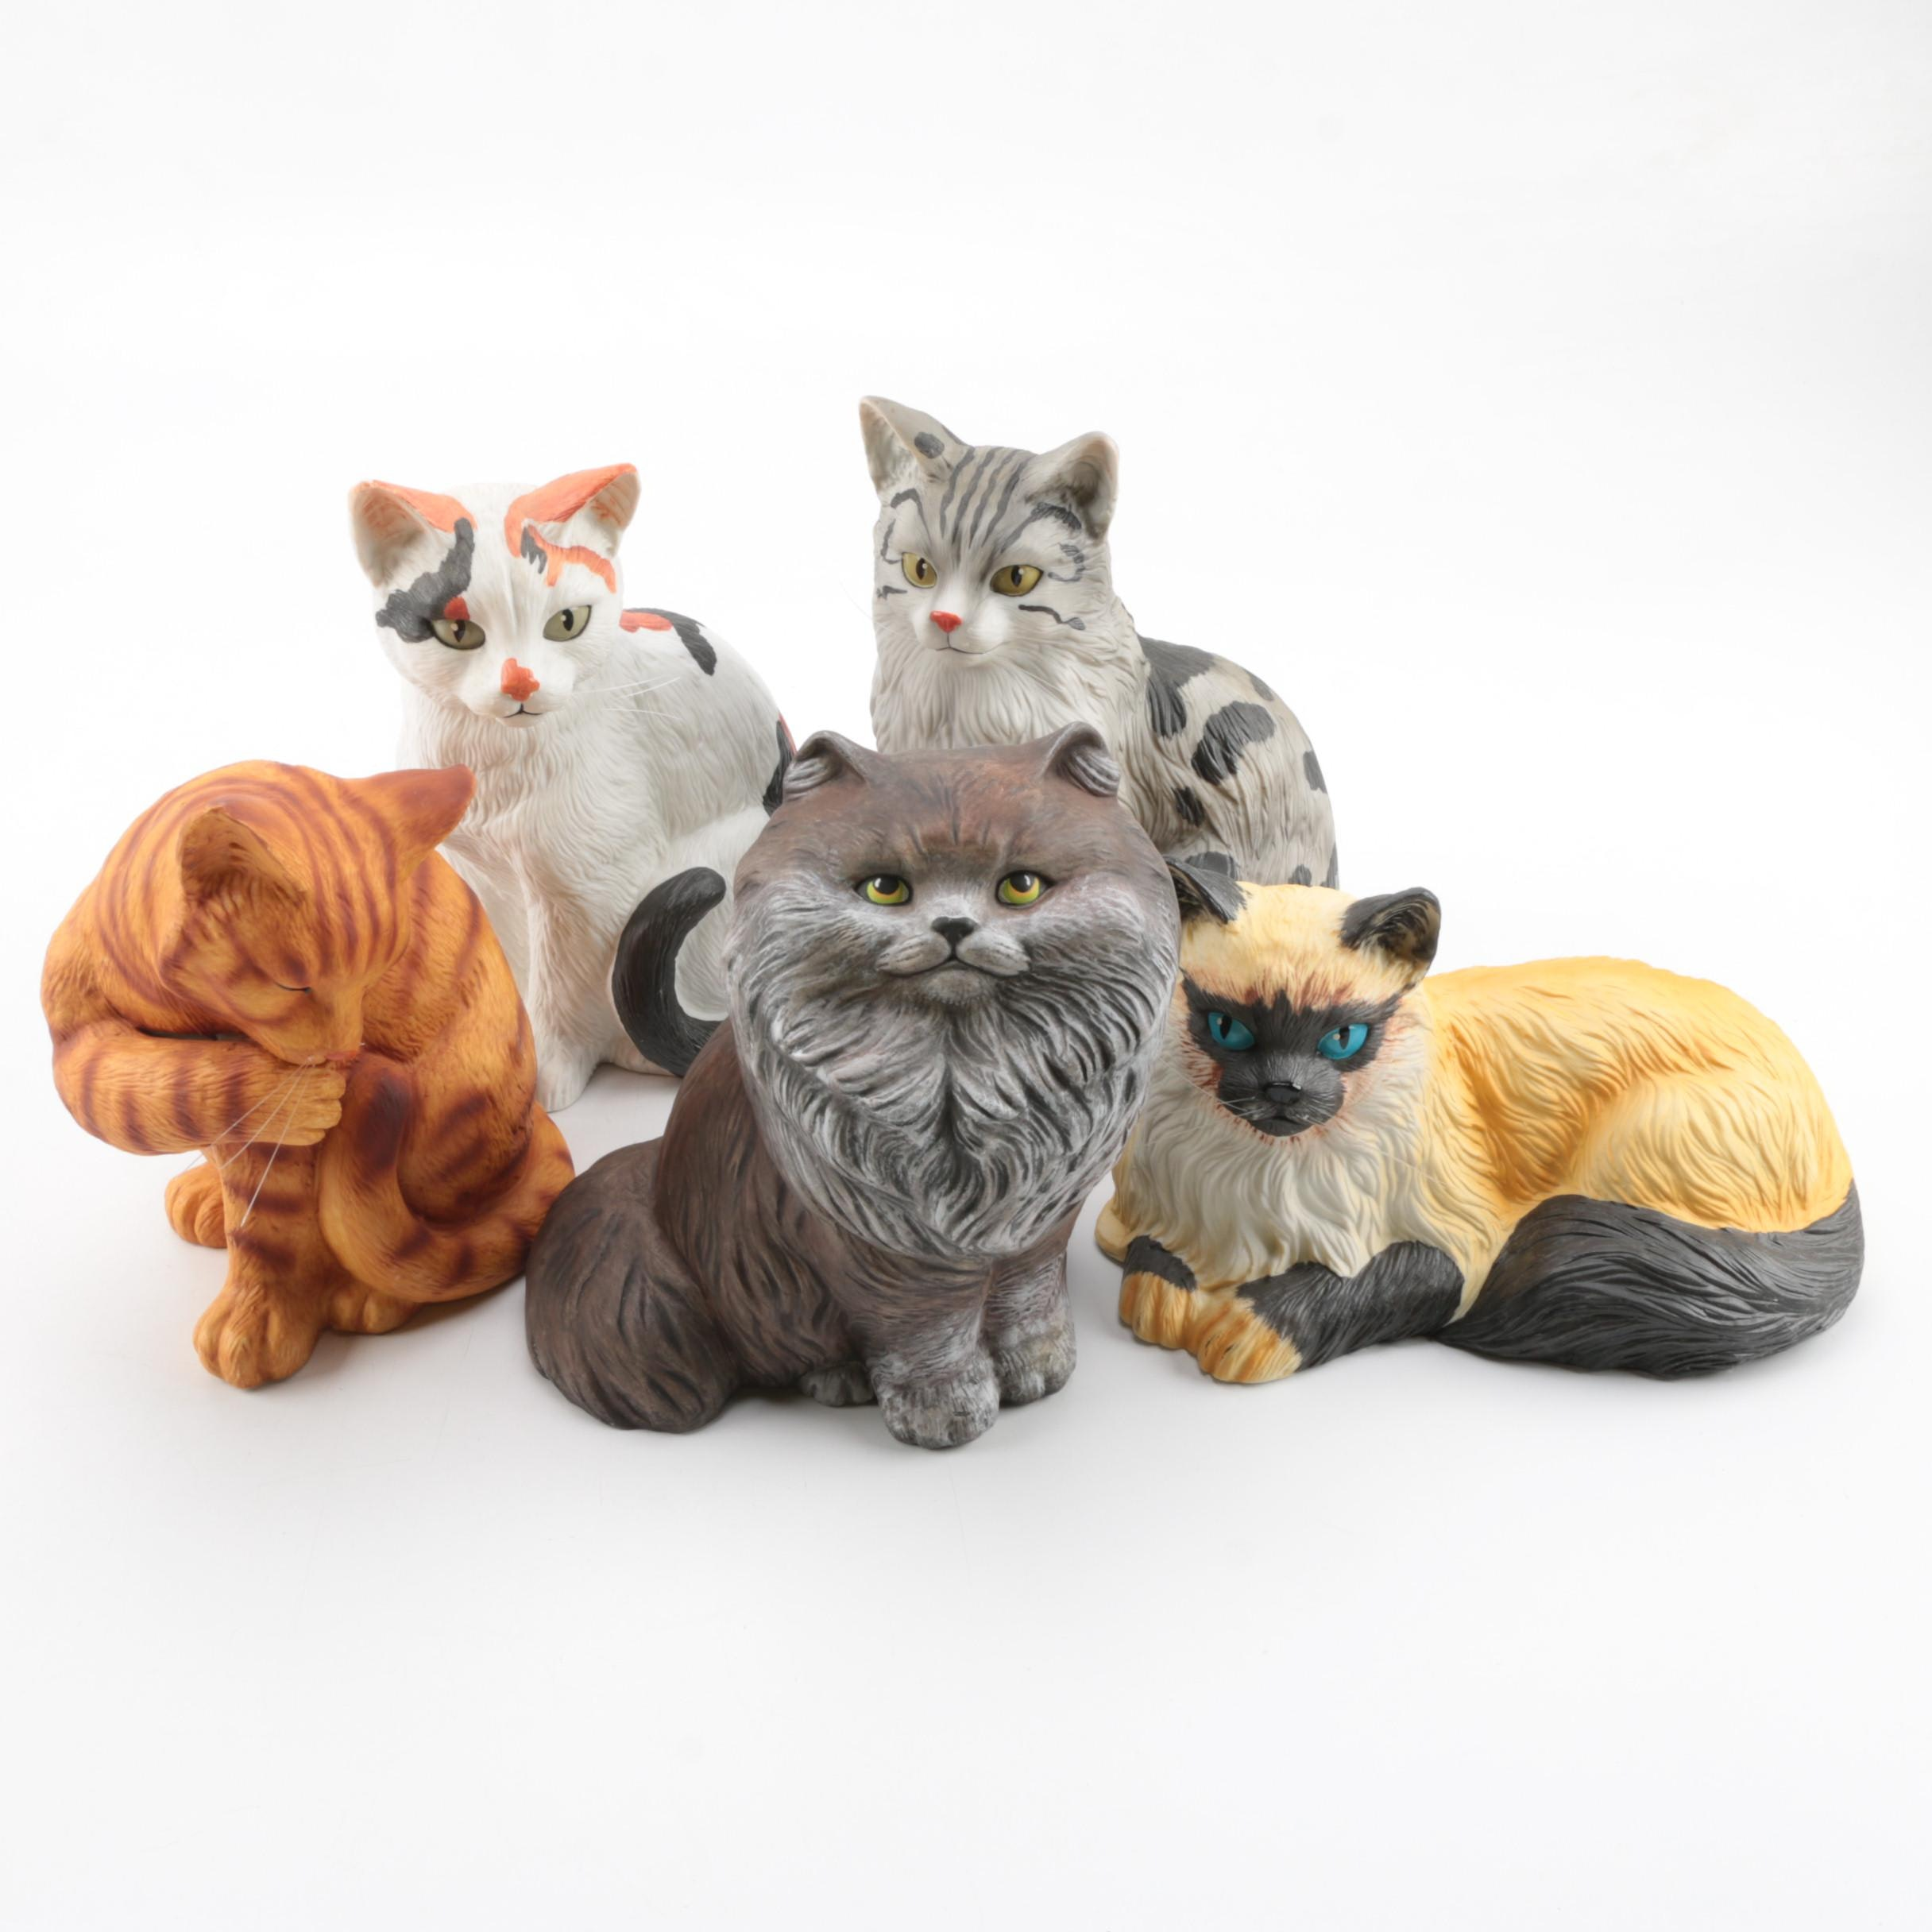 Ceramic Bisque Cat Figurines by Mann